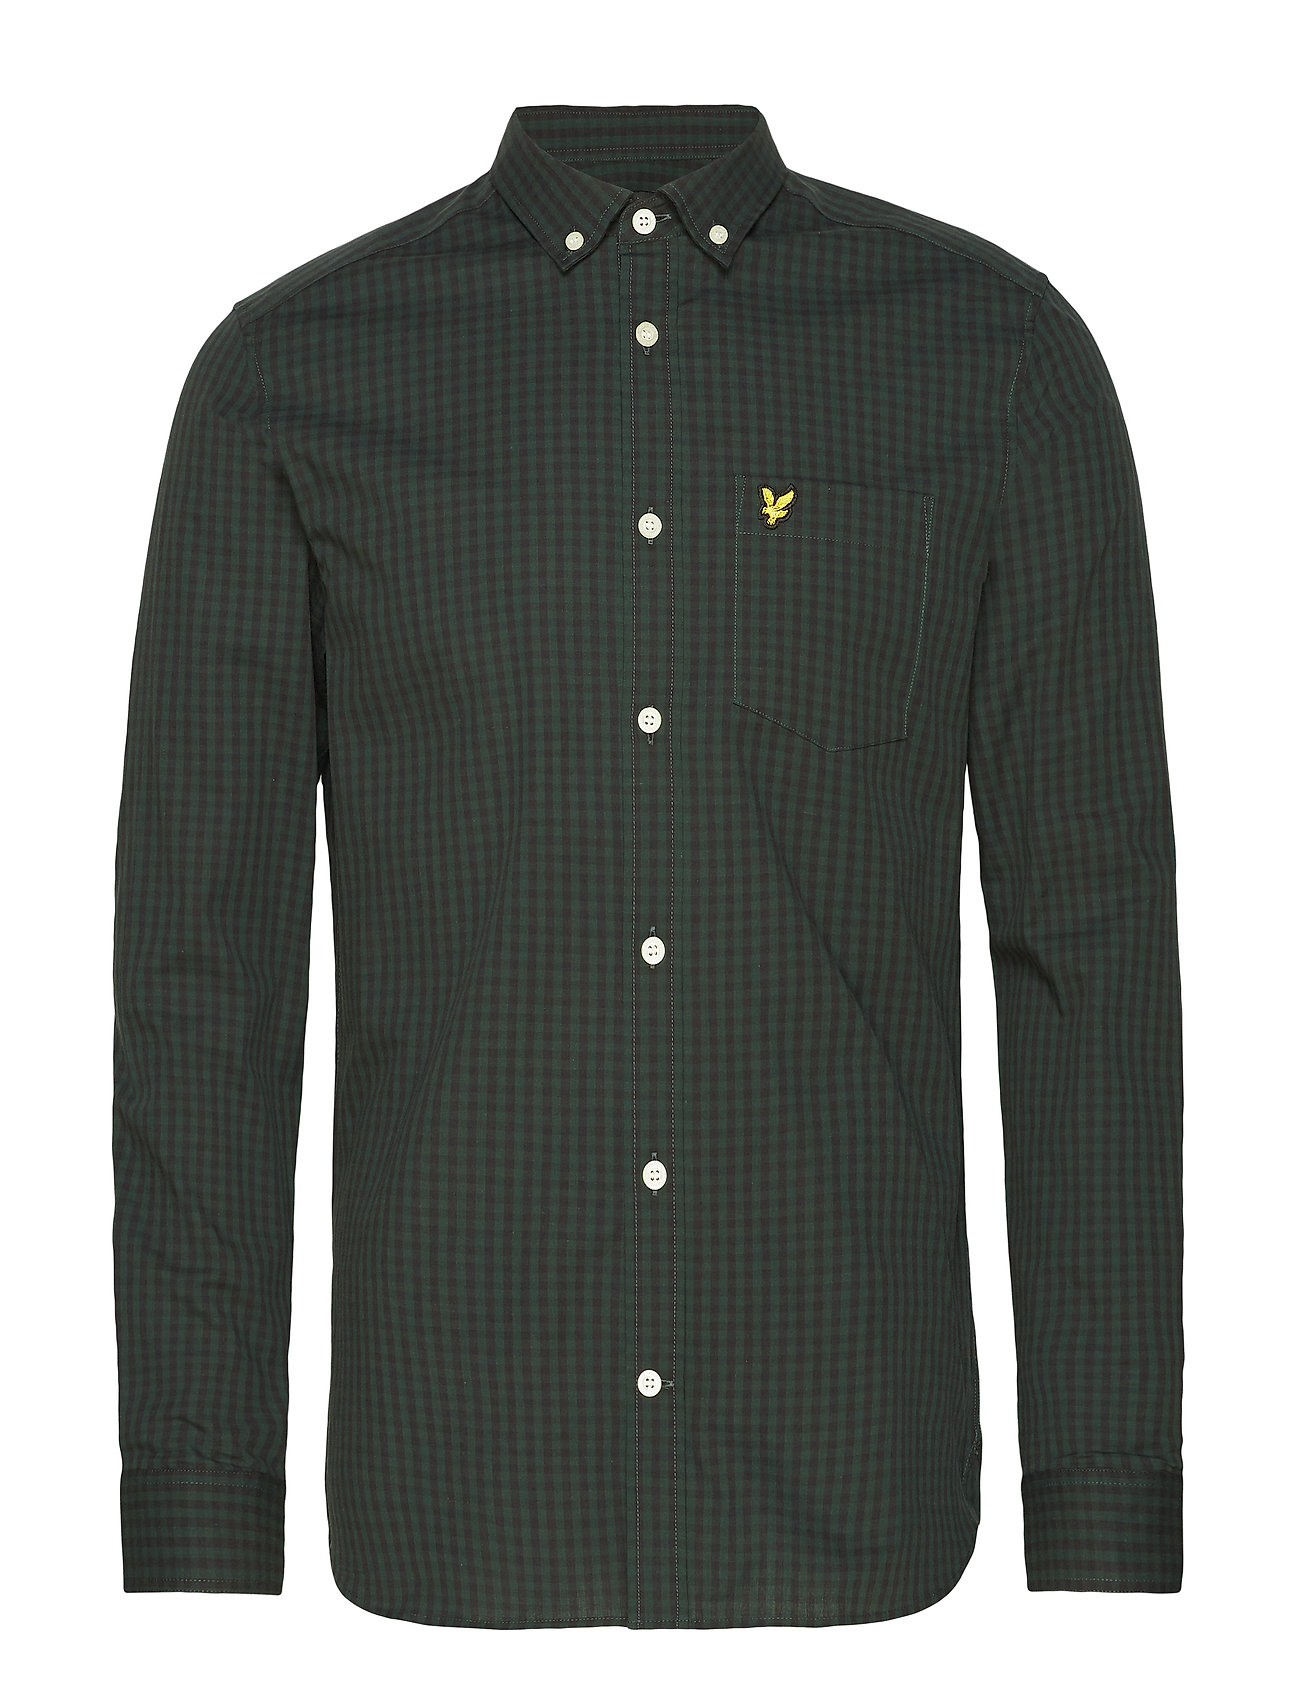 Lyle & Scott LS Slim Fit Gingham Shirt - TRUE BLACK/JADE GREEN